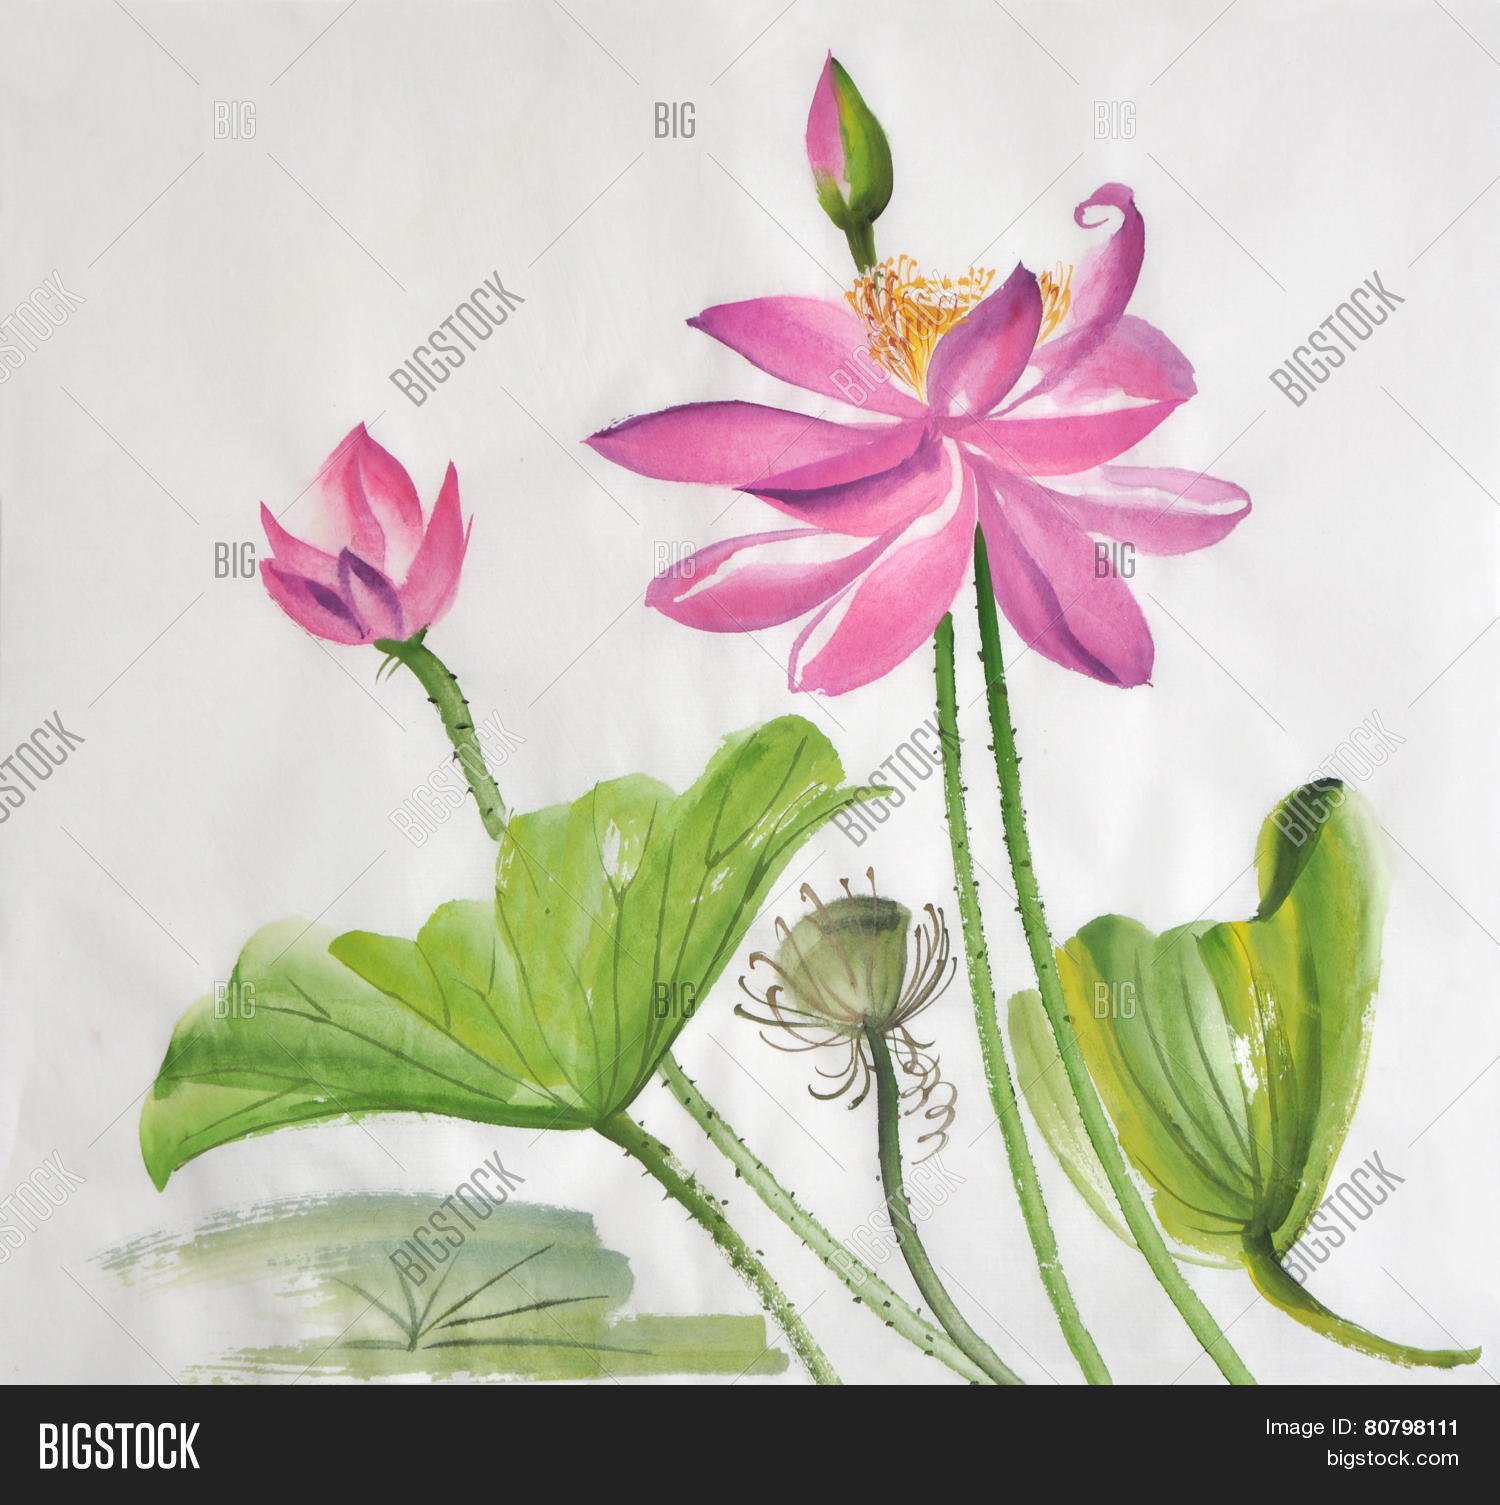 Lotus Flower Image Photo Free Trial Bigstock